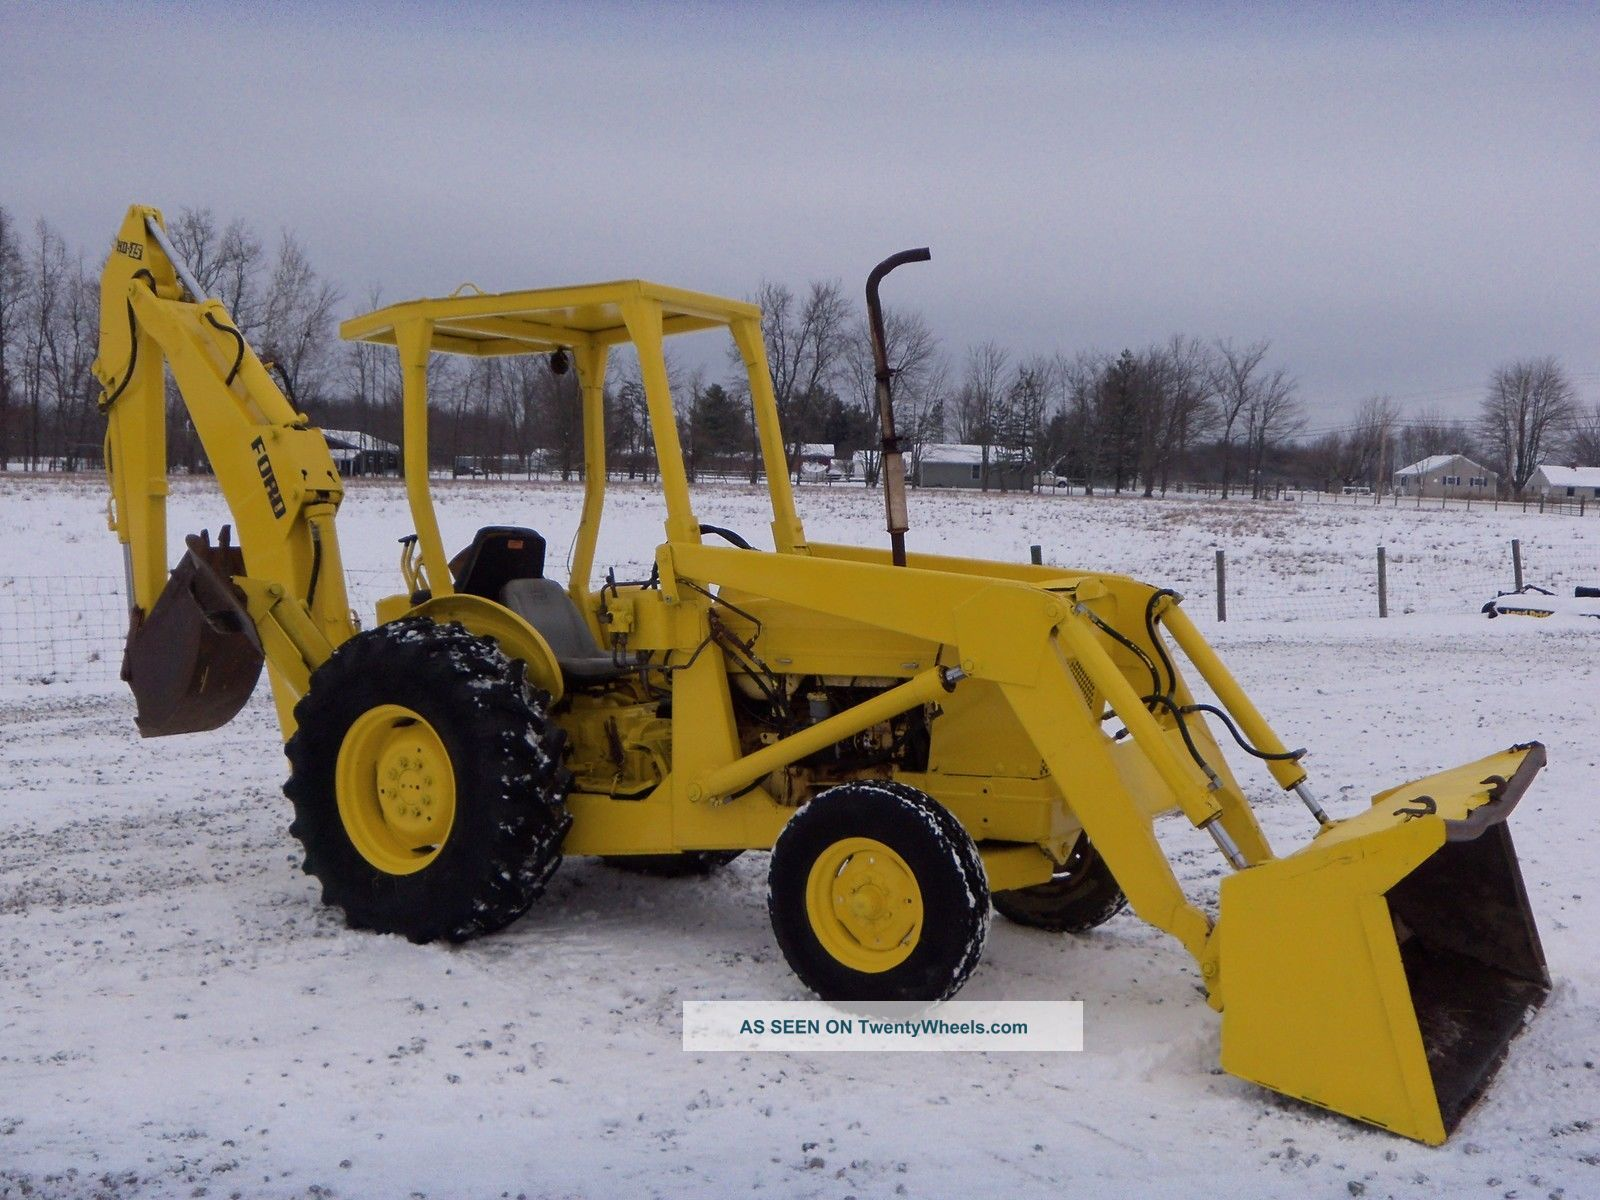 Ford 4500 Industrial Tractor Backhoe : Ford tractor loader backhoe